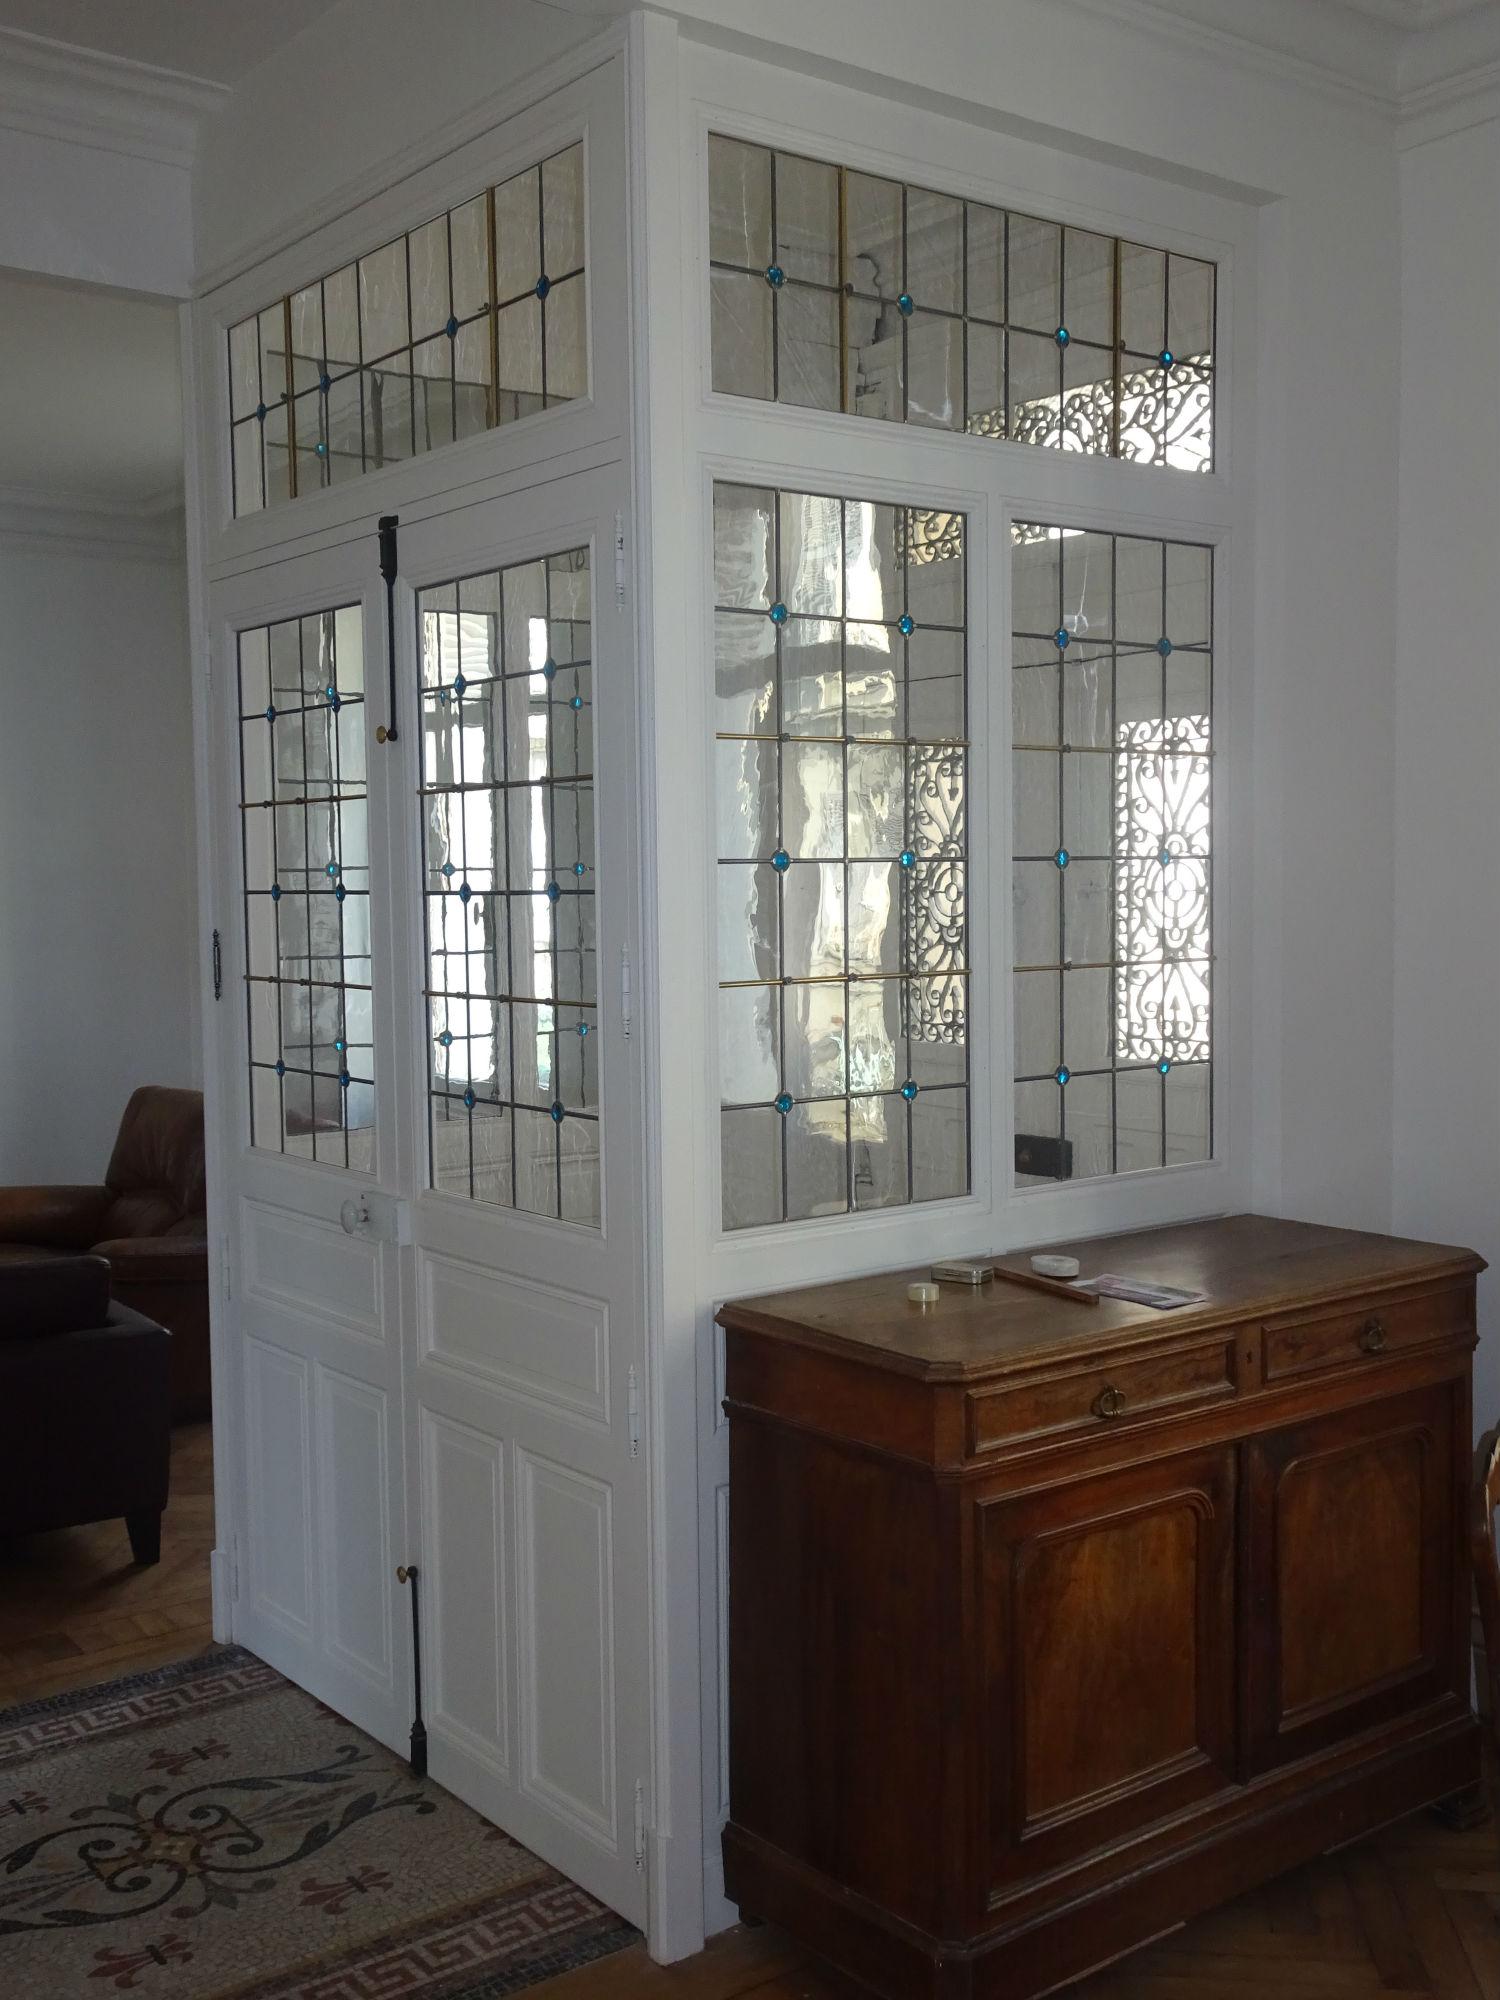 maison angevine barthe bordereau barthe bordereau. Black Bedroom Furniture Sets. Home Design Ideas